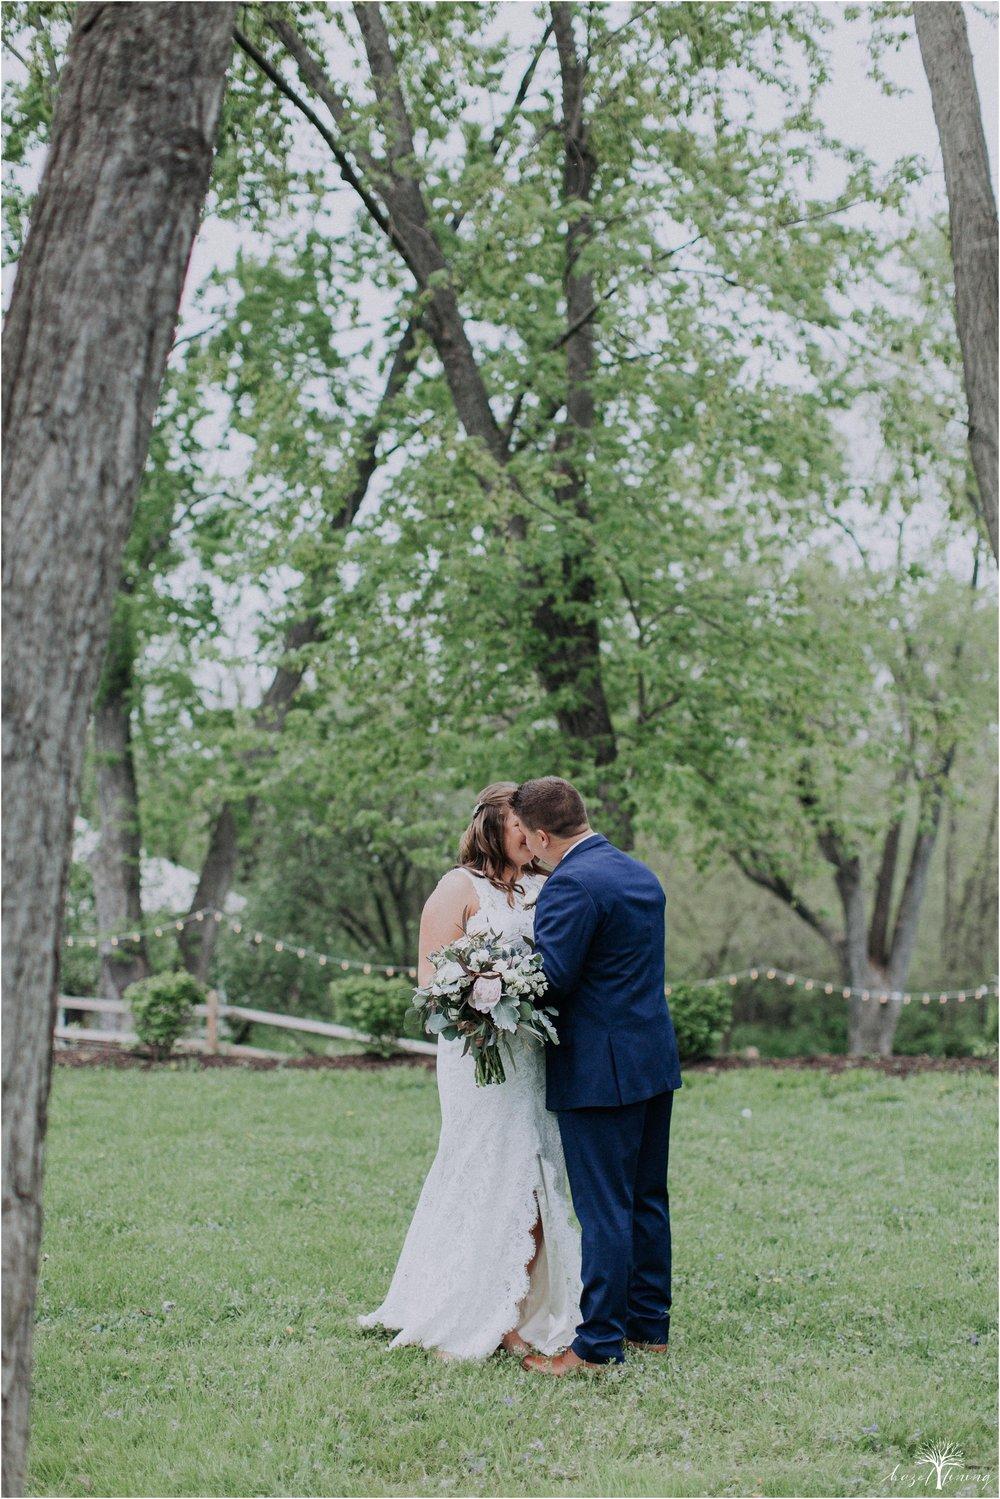 hazel-lining-travel-wedding-elopement-photography-abby-skyler-hunt-the-willis-house-york-pennsylvania-outdoor-estate-wedding_0028.jpg